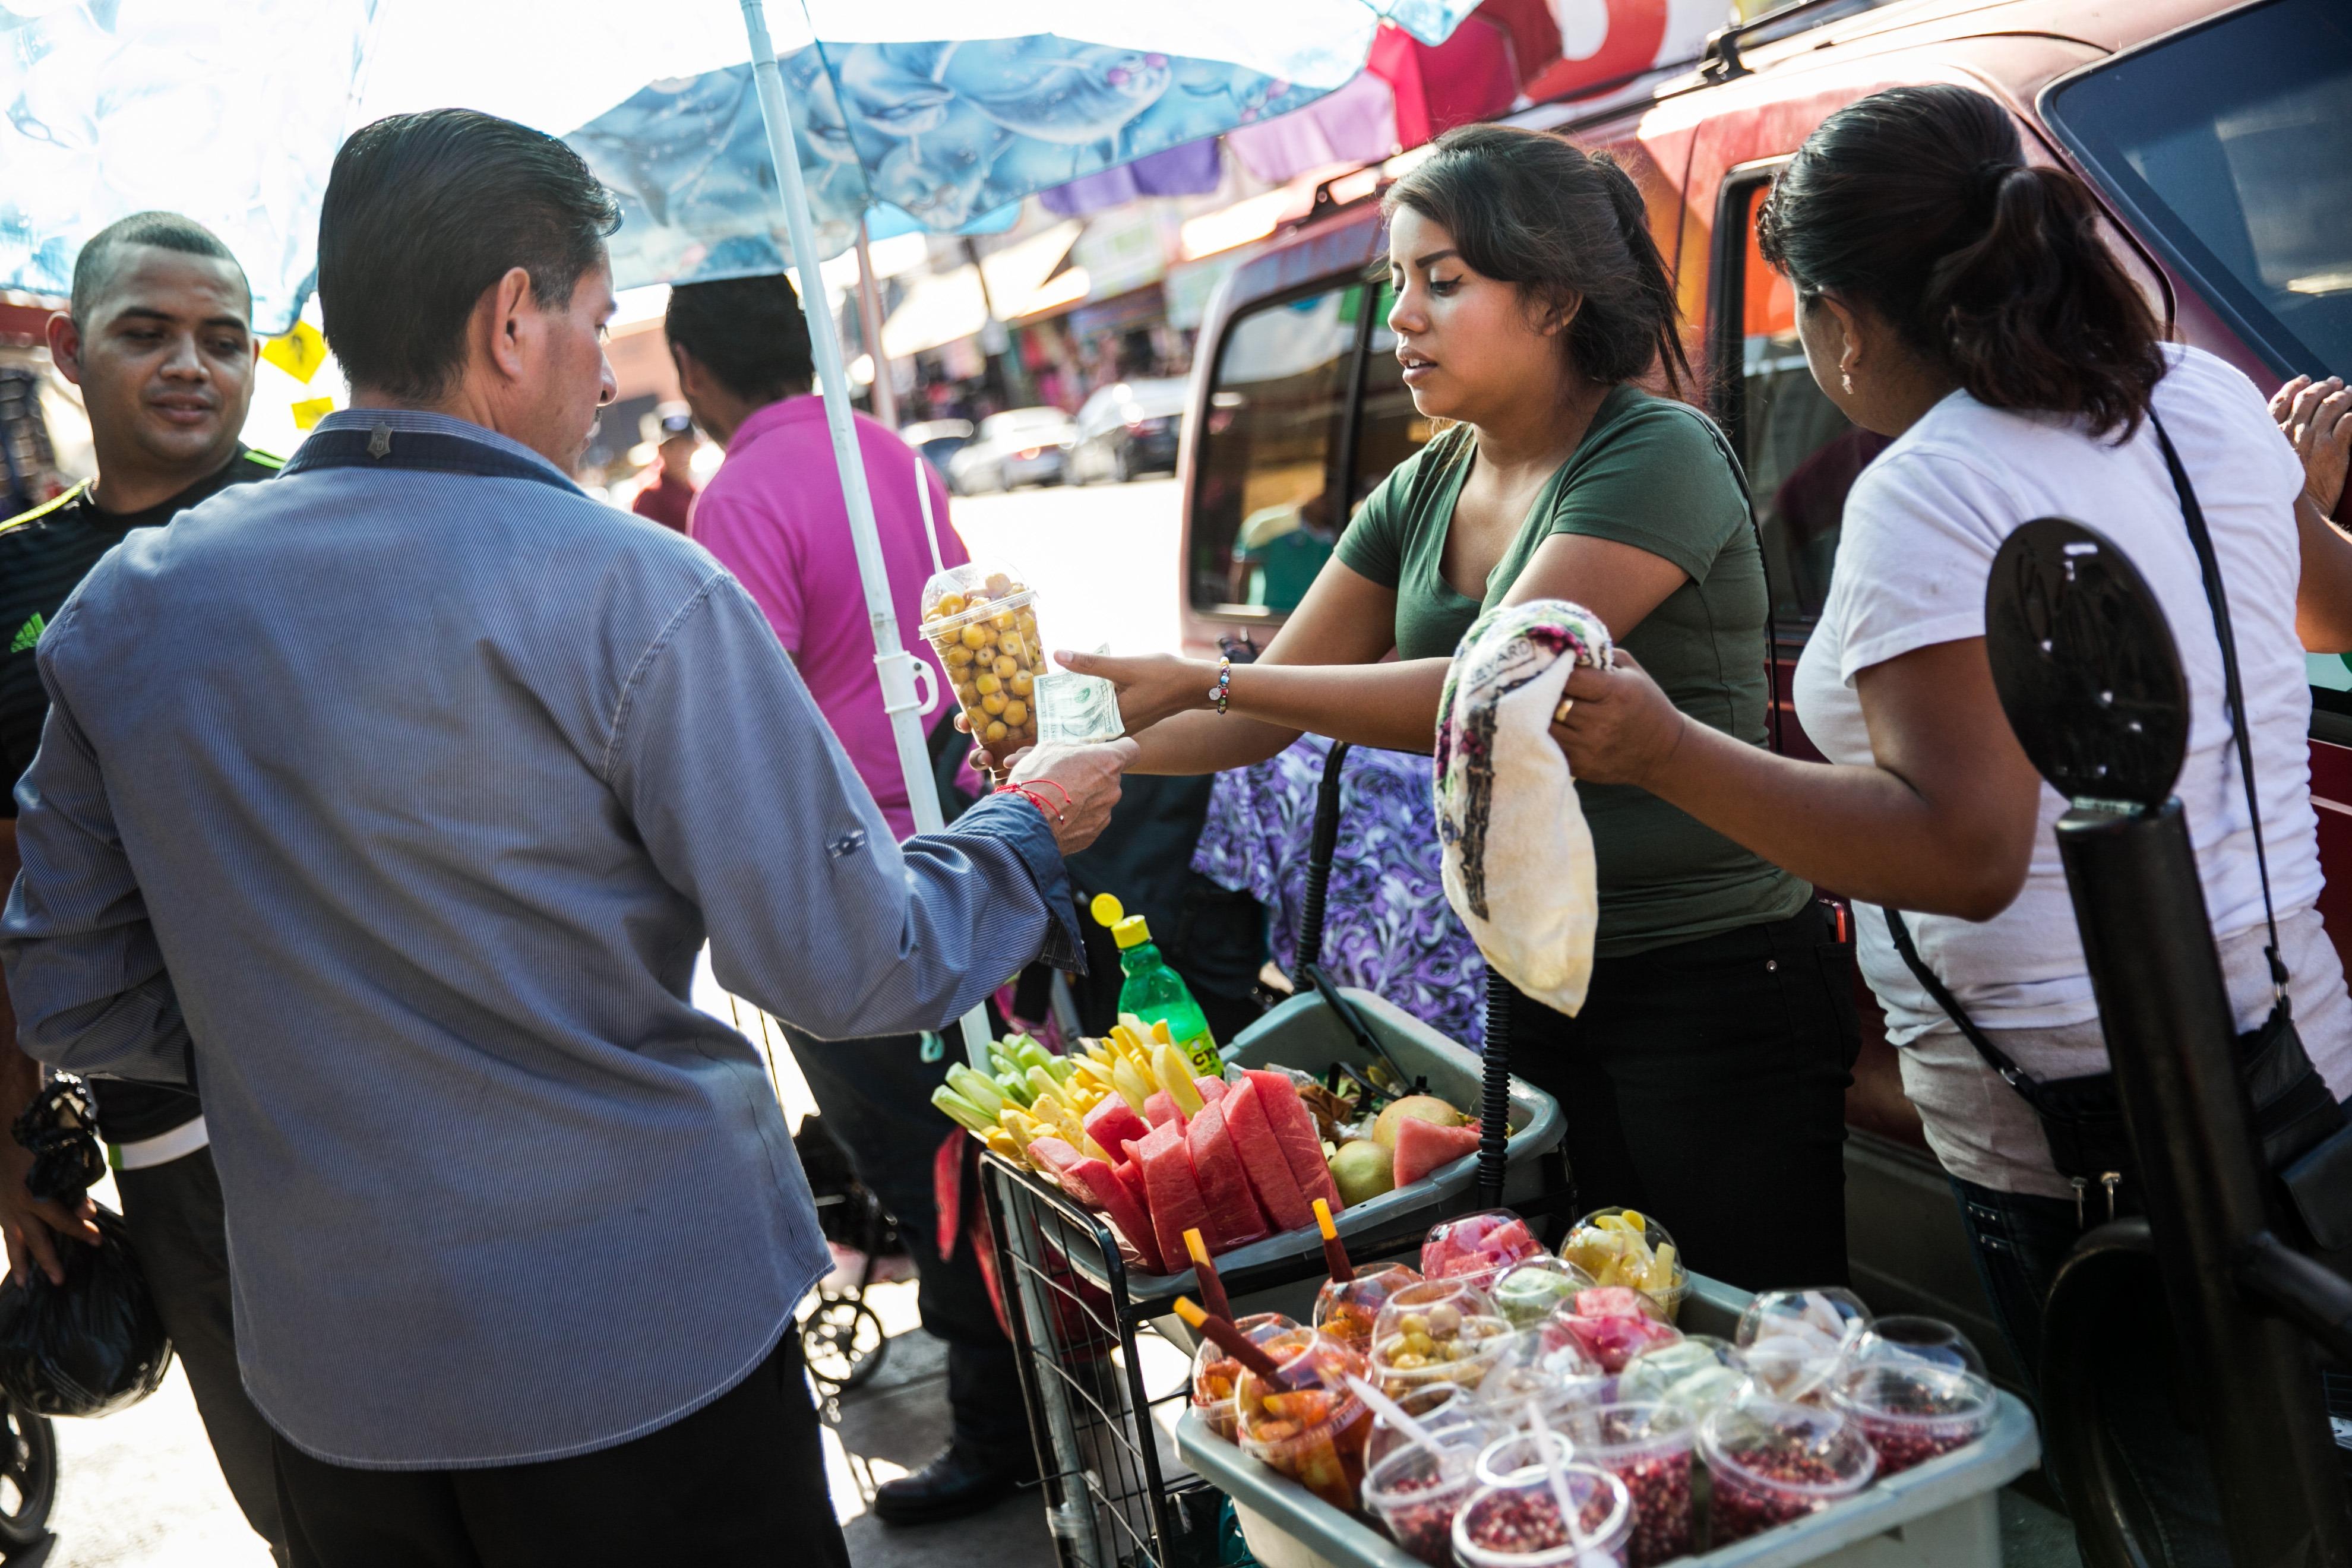 Why street vendors make cities feel safer